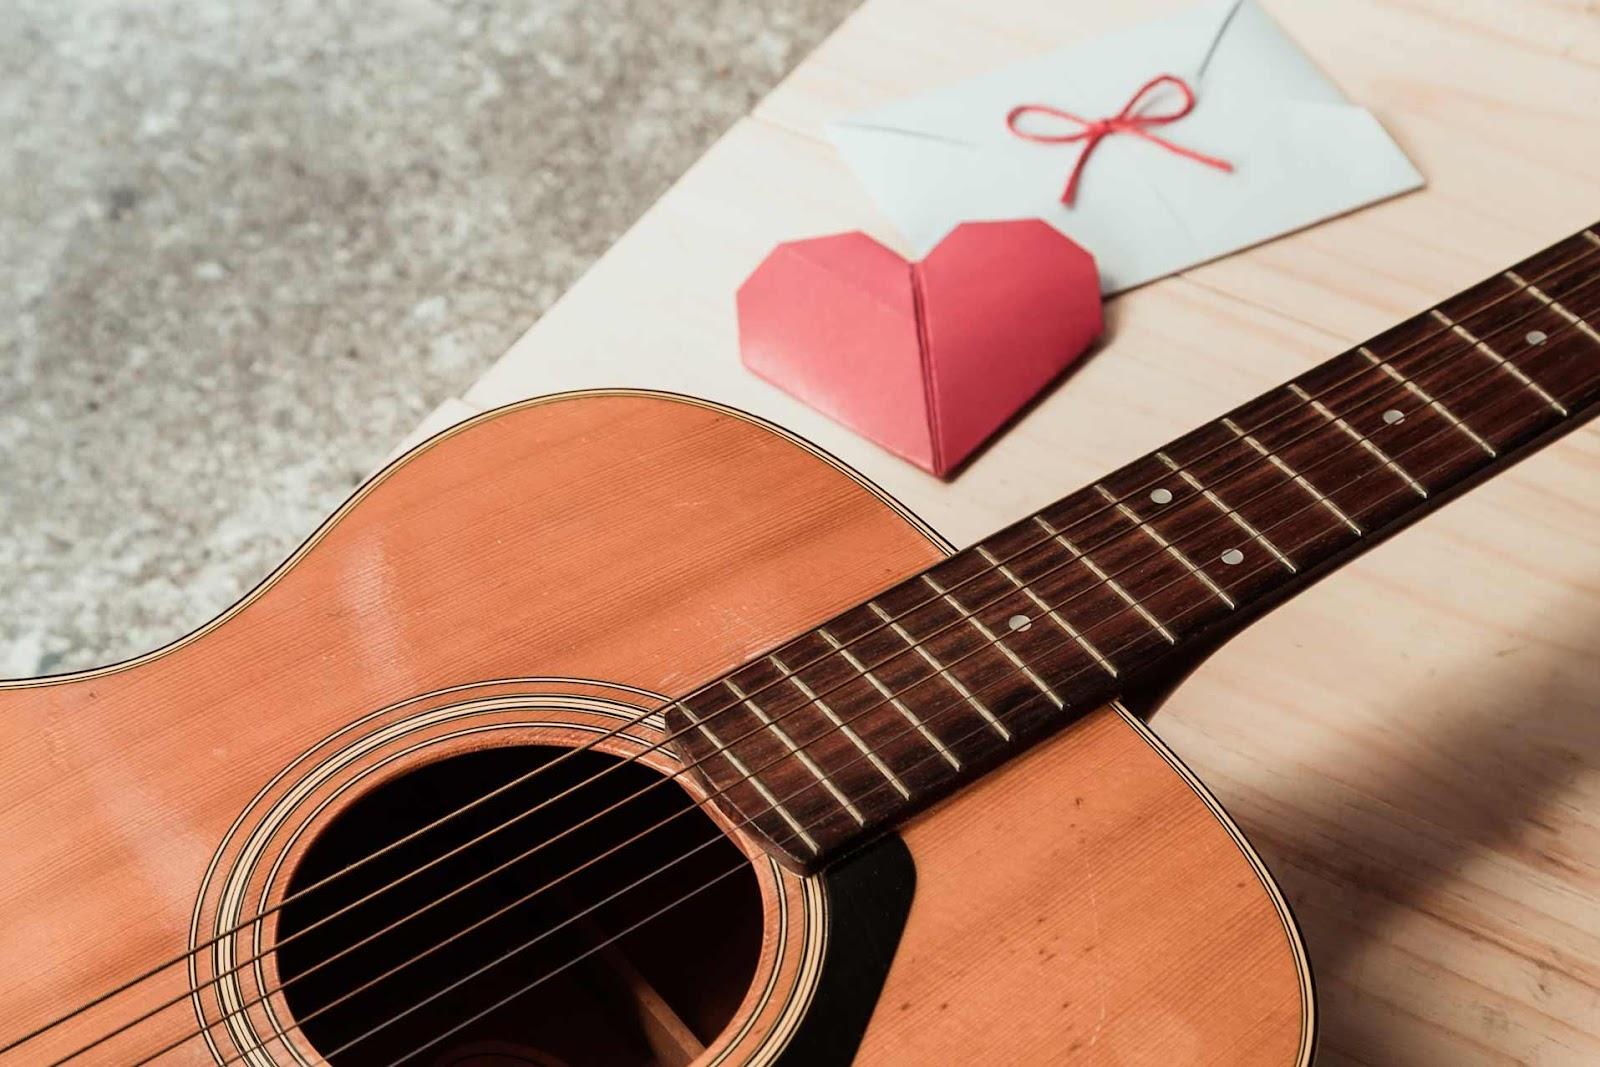 D:\Работа\SEO\GUEST POSTS\POSTS 2019\28.08.2019\Uyo Top_10_Best_Love_Songs_For_Wedding\shutterstock_1019521231(1).jpg